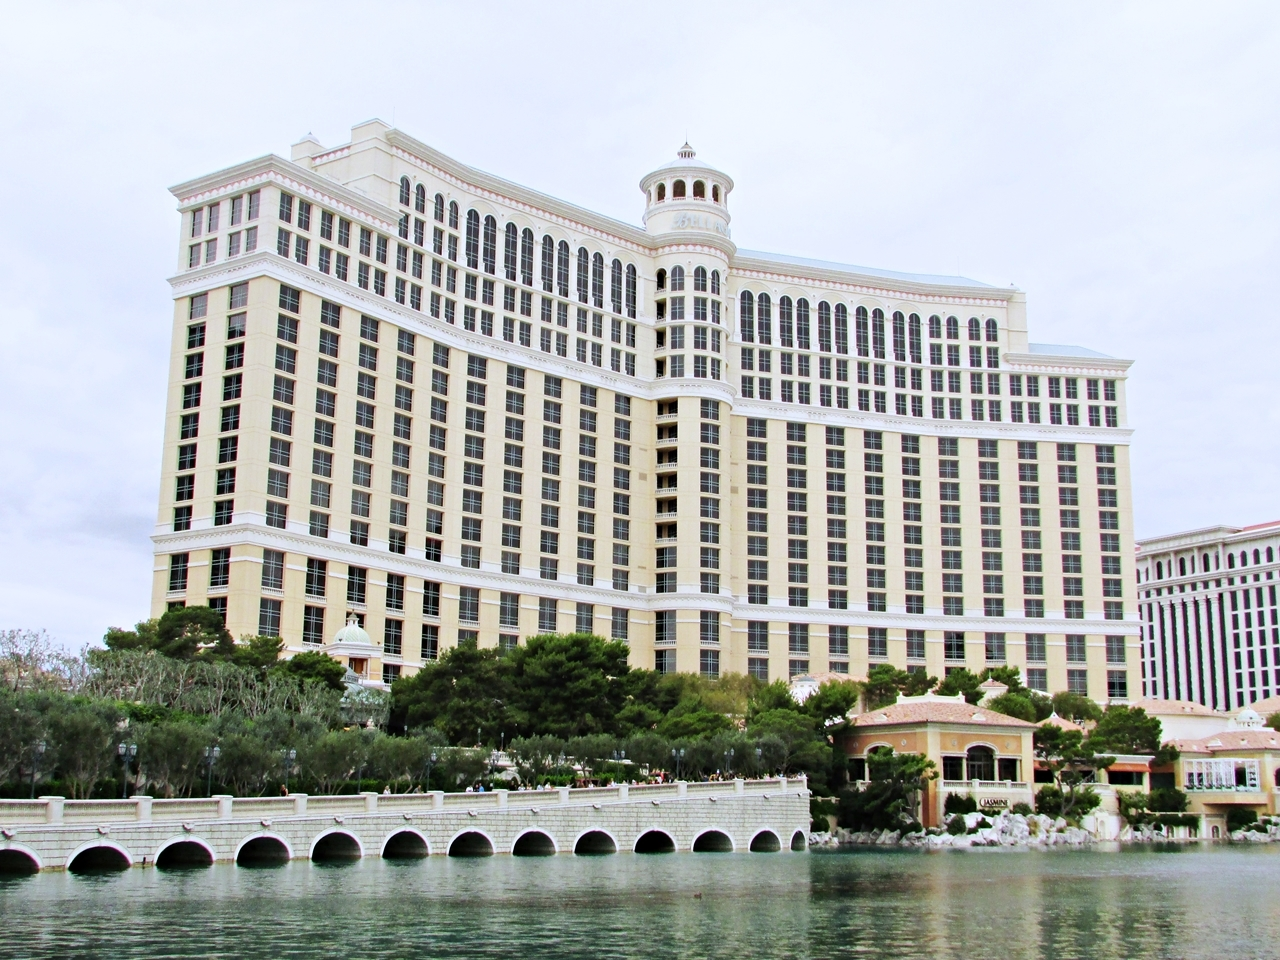 USA Rundreise - Amerika Westküste - Las Vegas Bellagio - Fashionladyloves